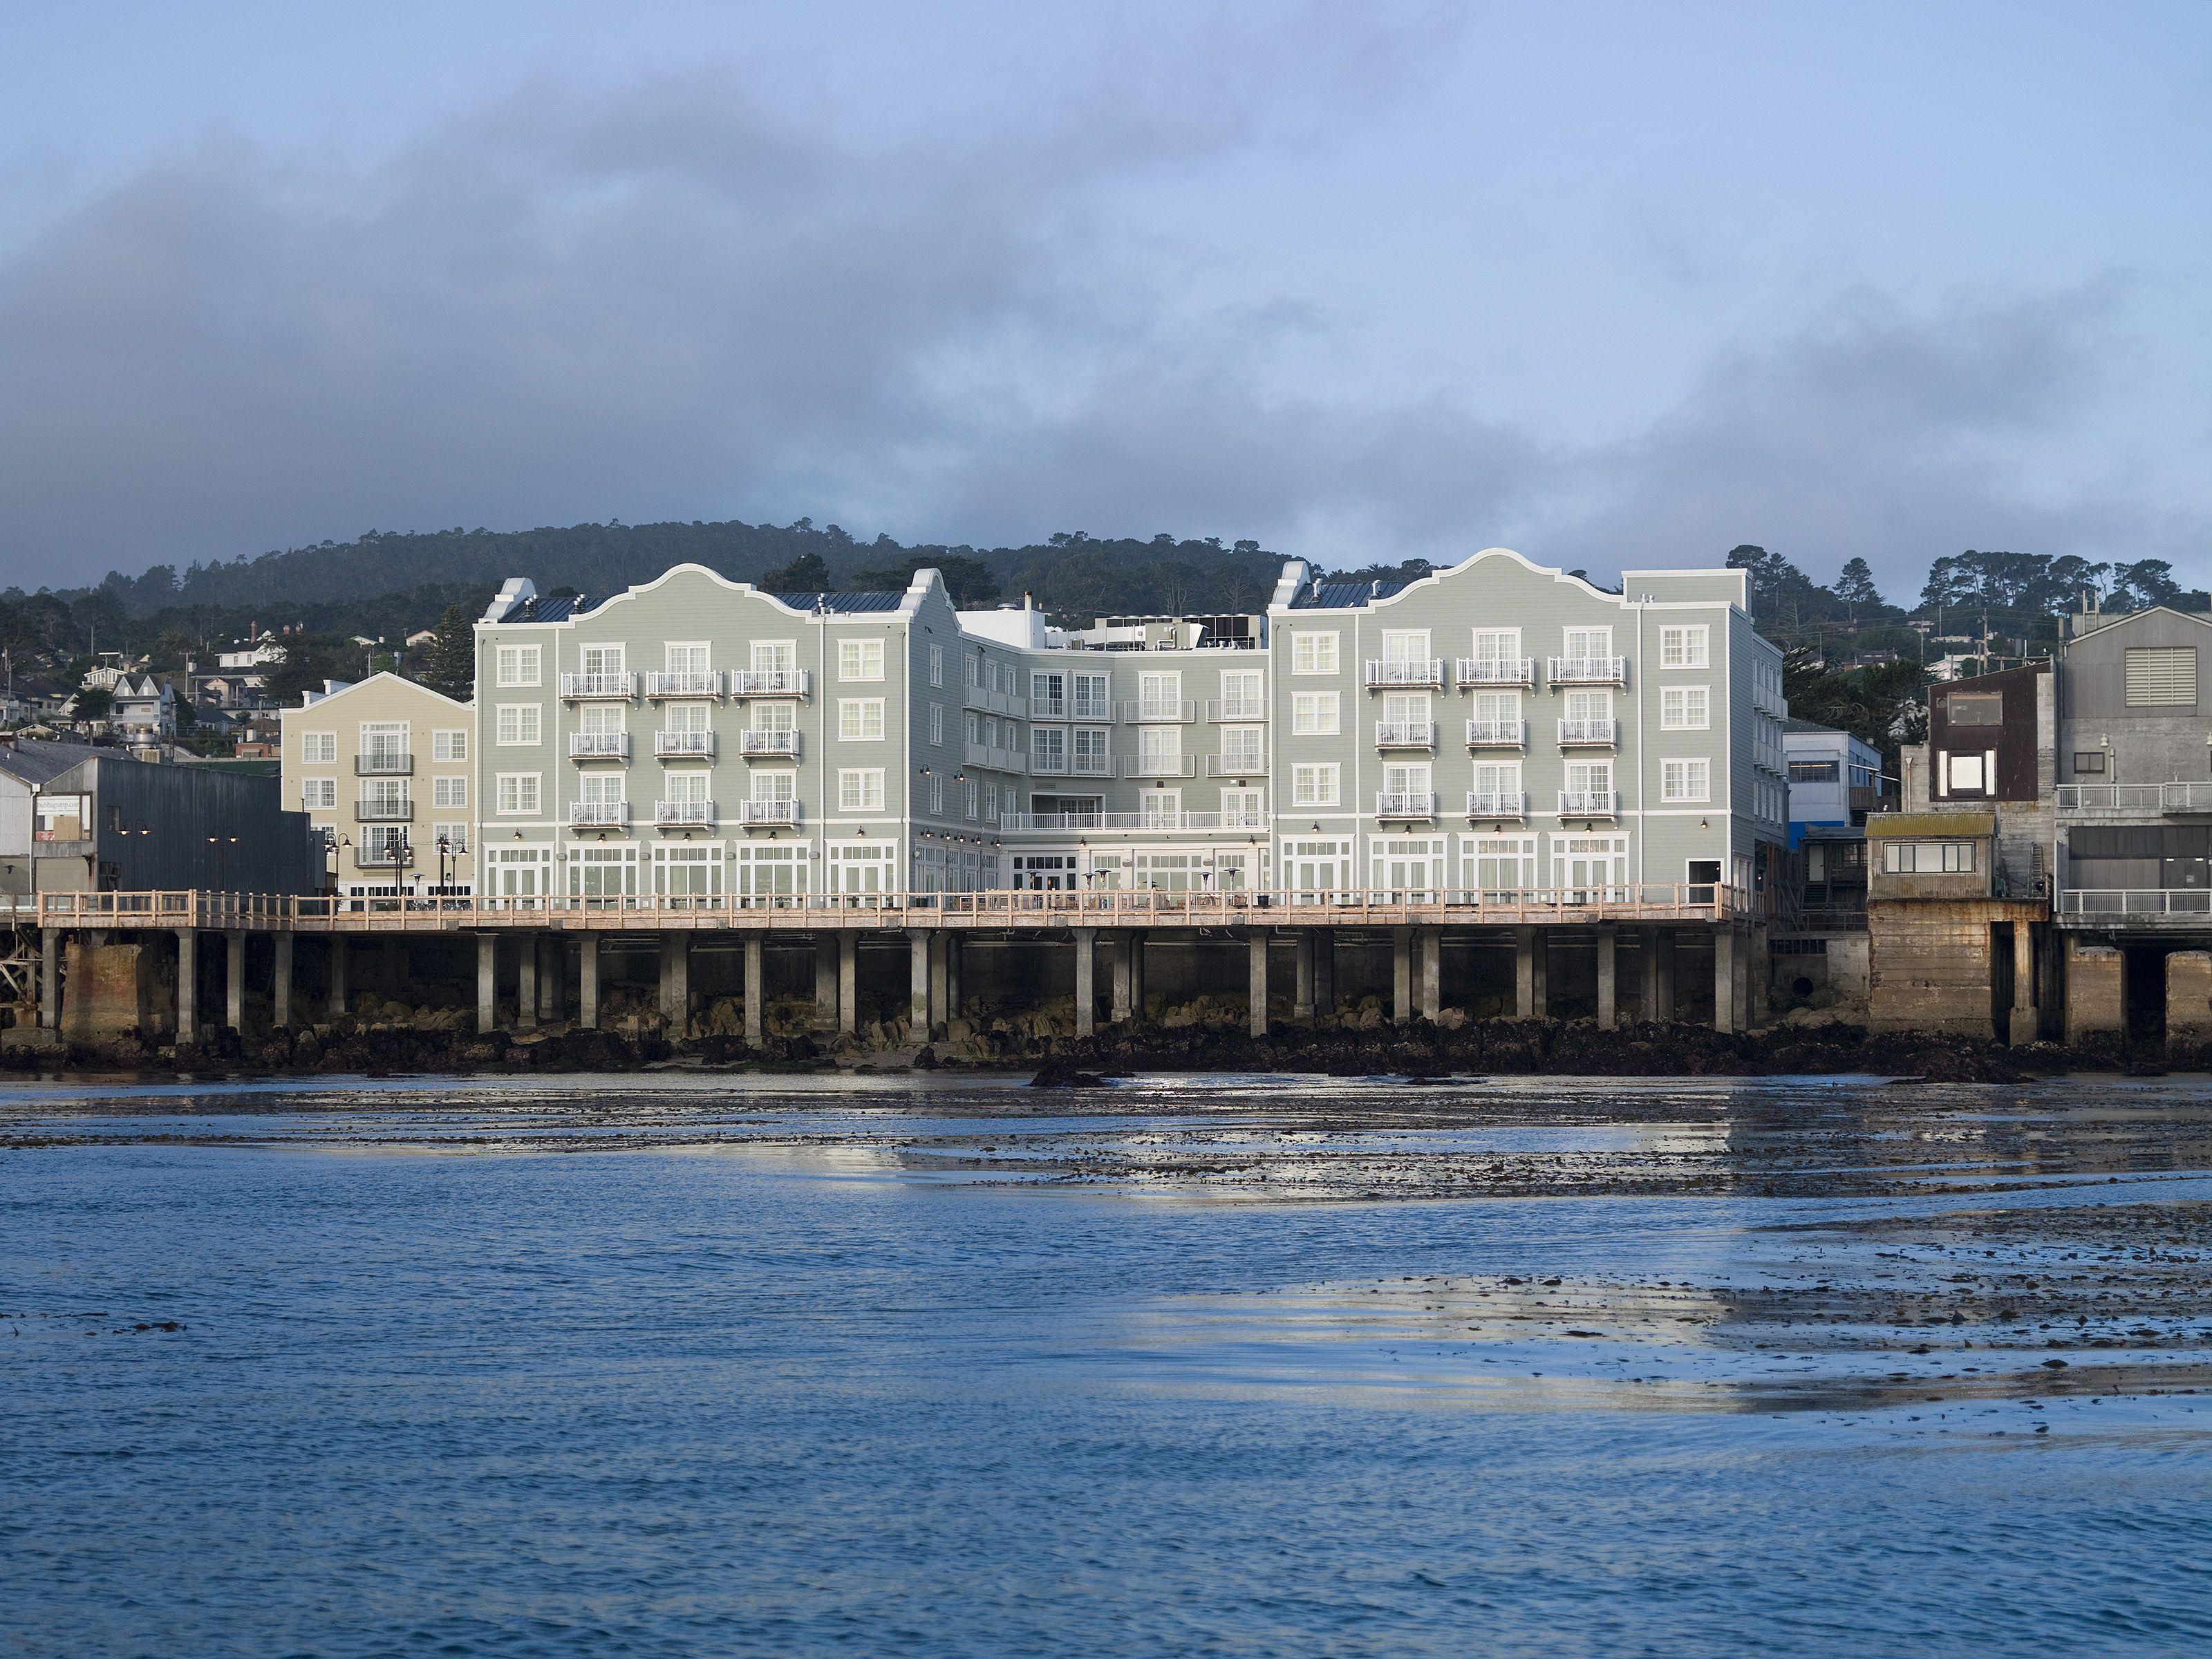 The Clement Monterey Hotel Honeymoon Stay